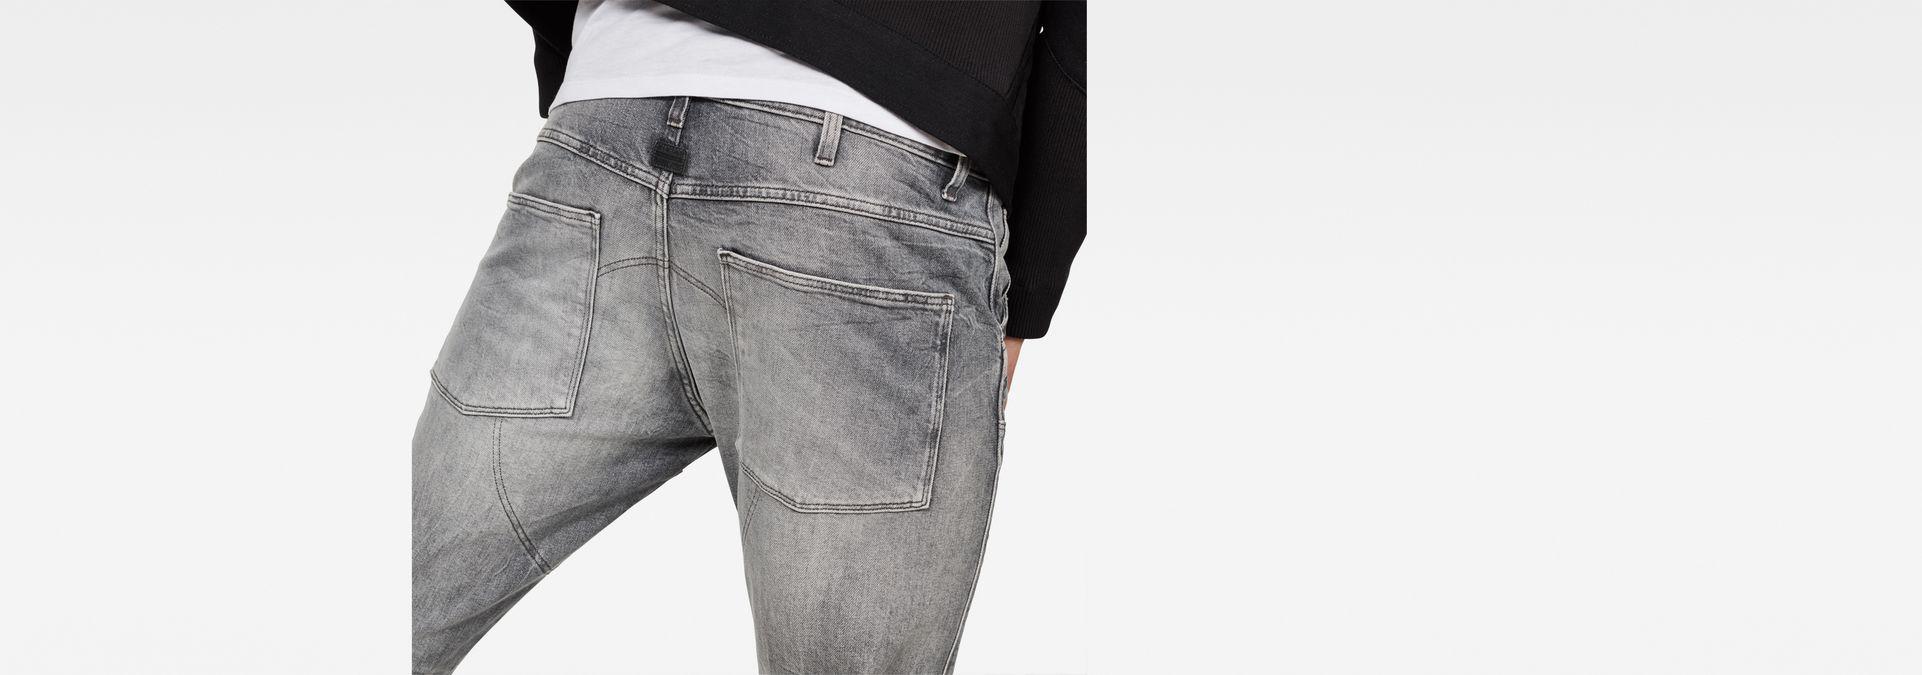 adb056d4955 ... G-Star RAW® 5620 G-Star Elwood 3D Slim Jeans Grey ...